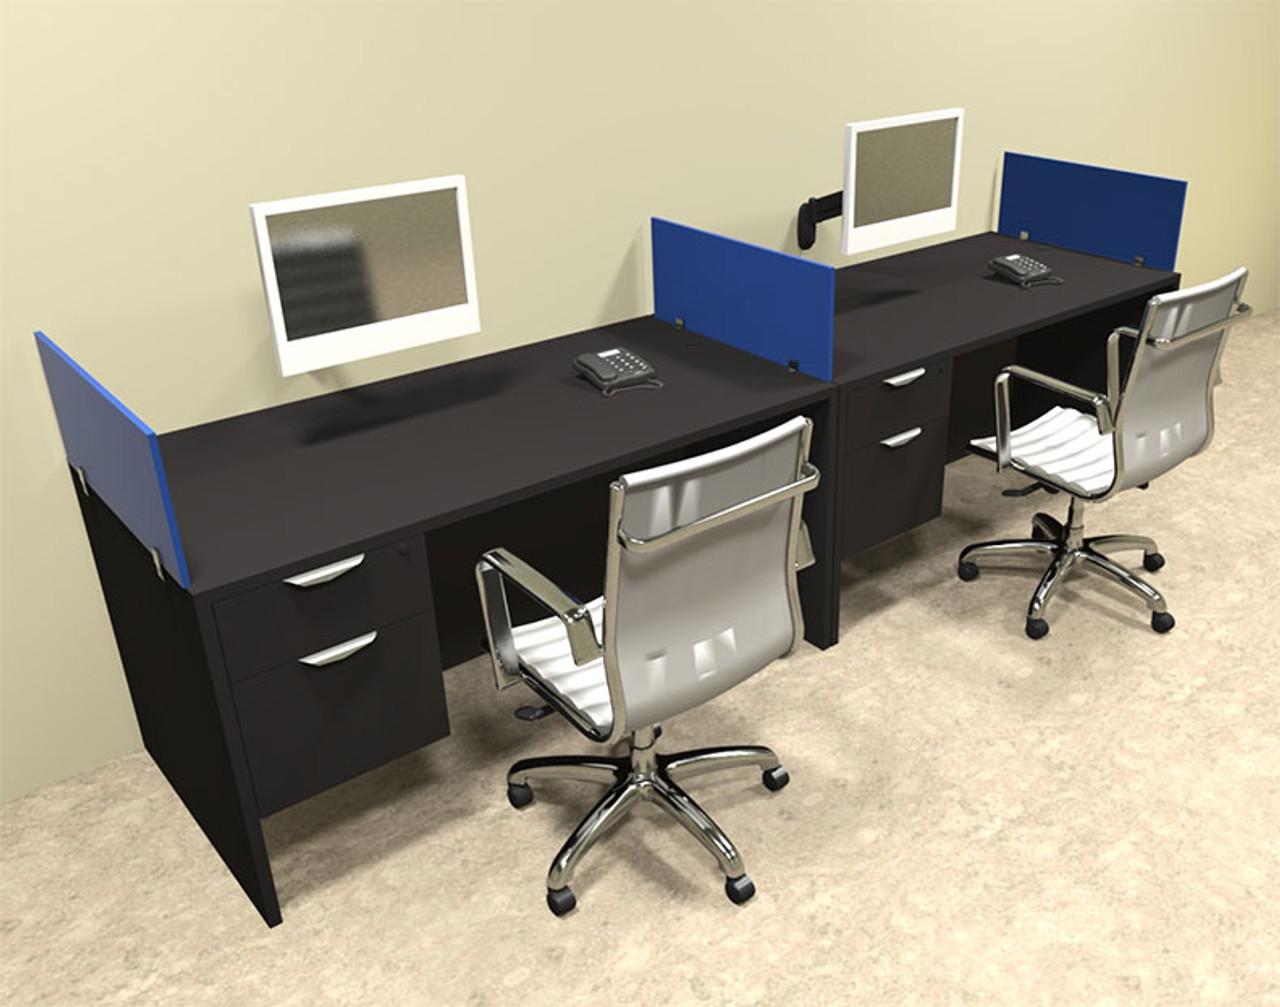 Two Person Blue Divider Office Workstation Desk Set, #OT-SUL-SPB24